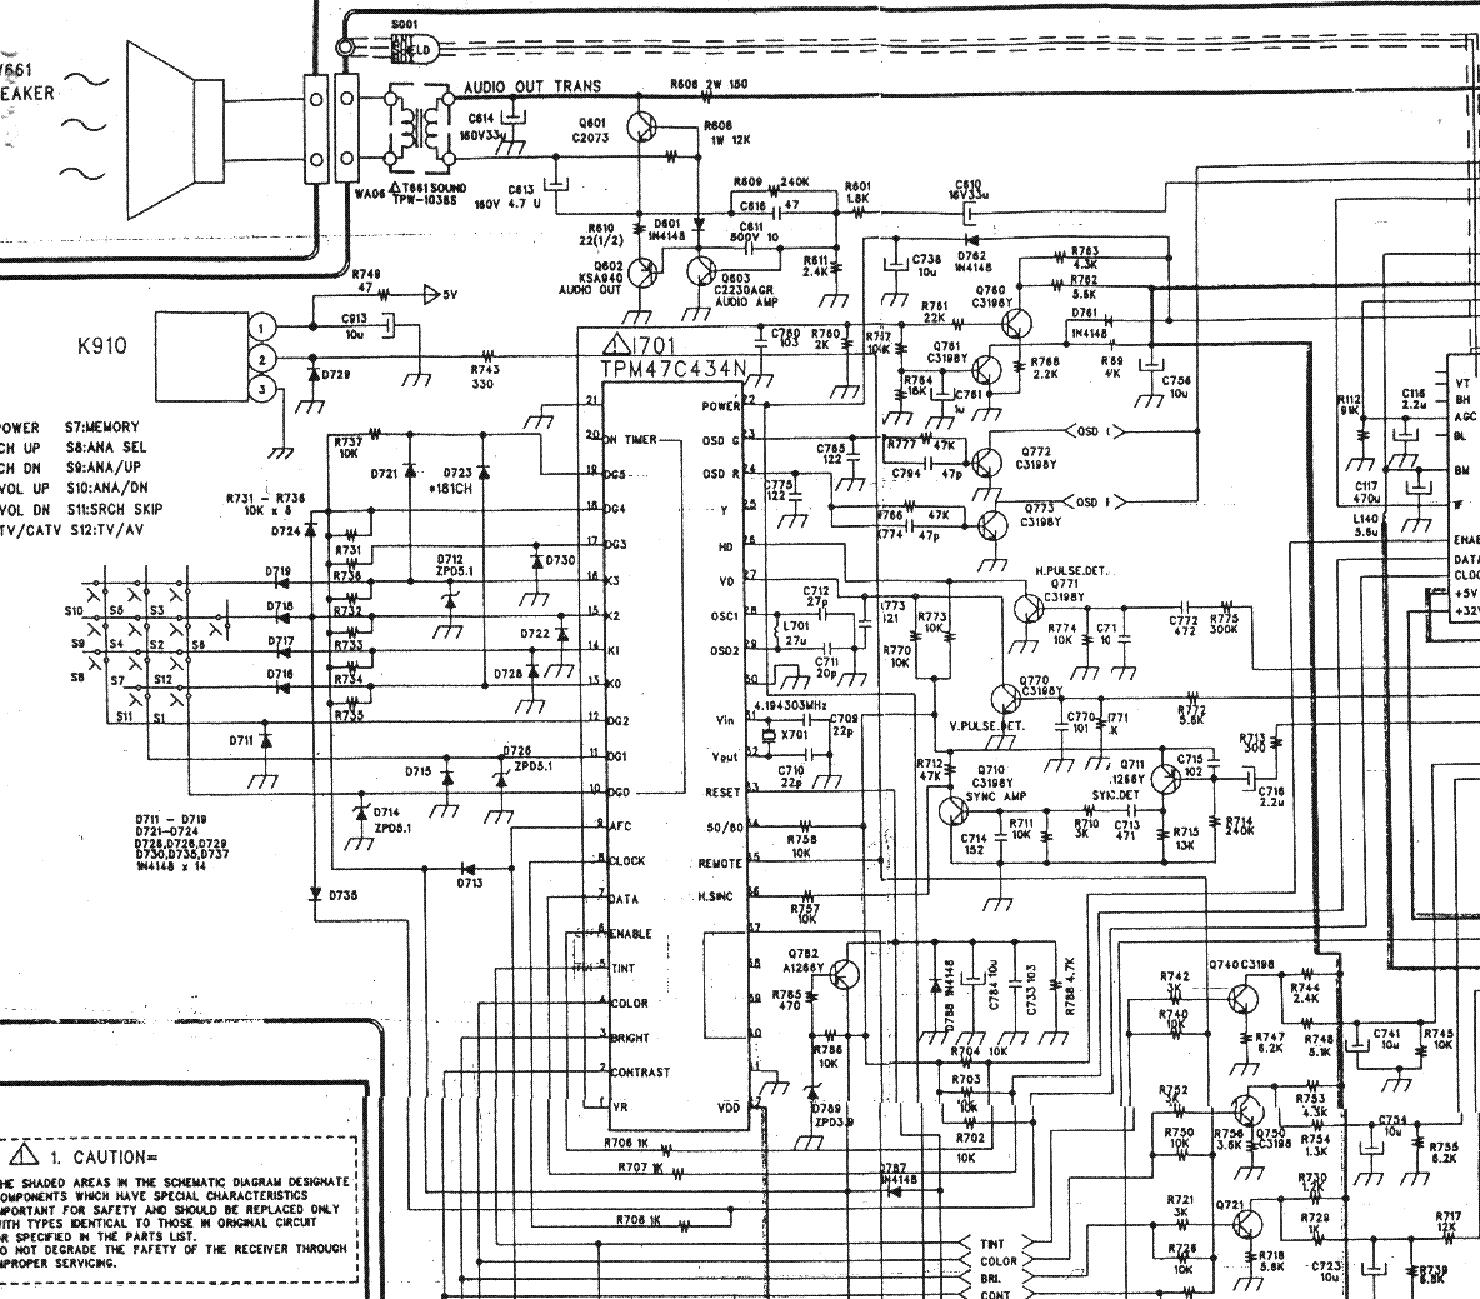 daewoo cn52n service manual download  schematics  eeprom